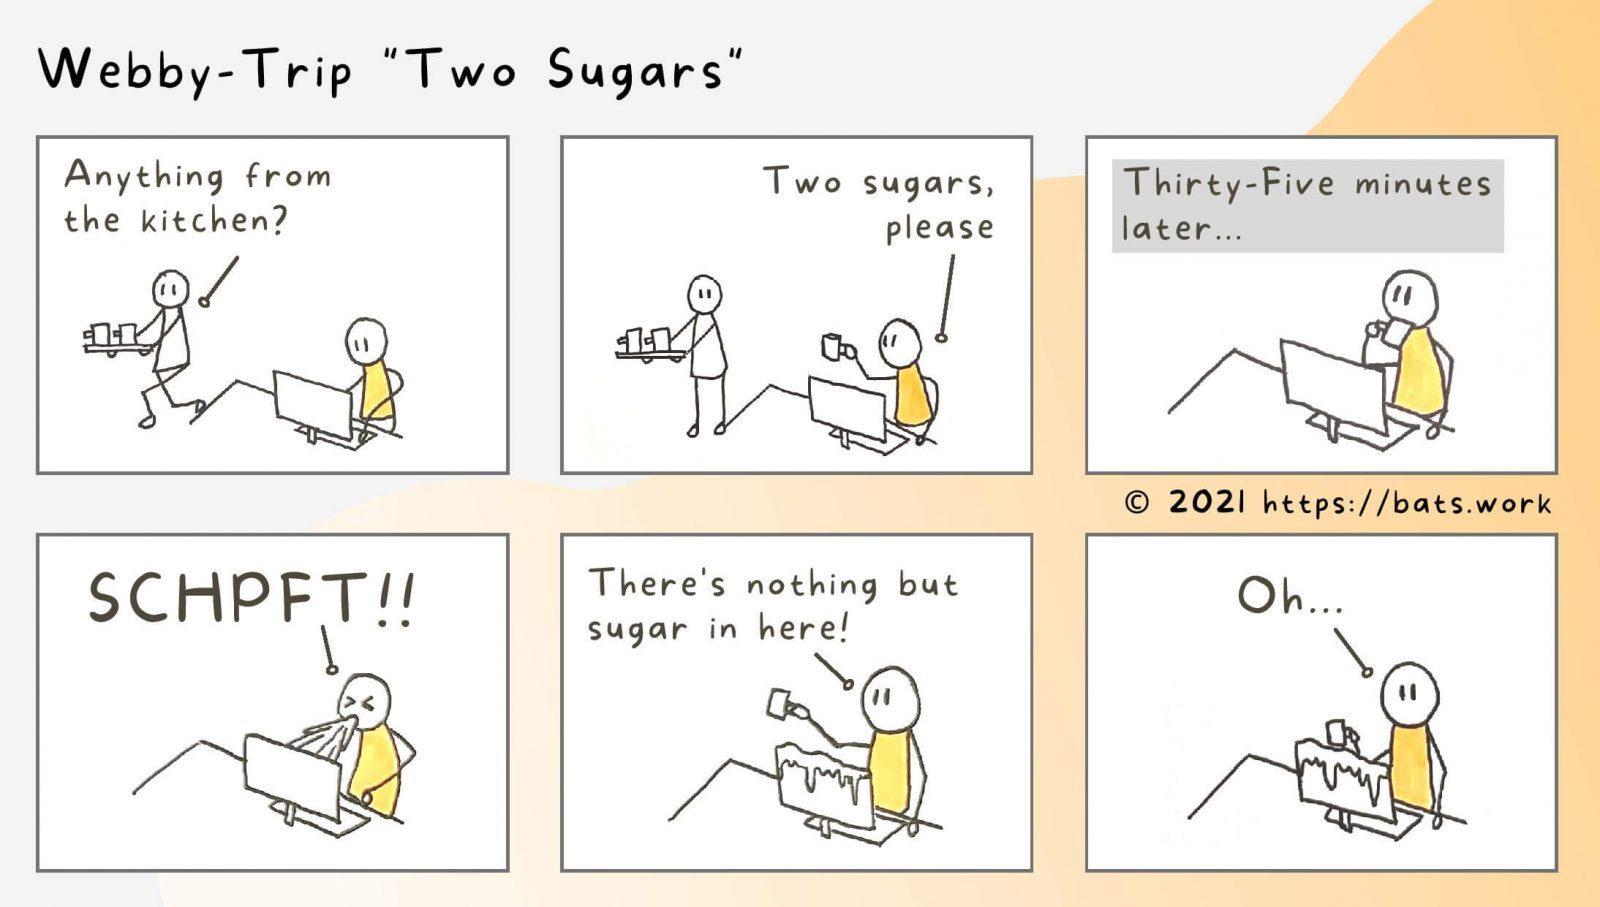 Webby Trip Two Sugars Comic Strip Art